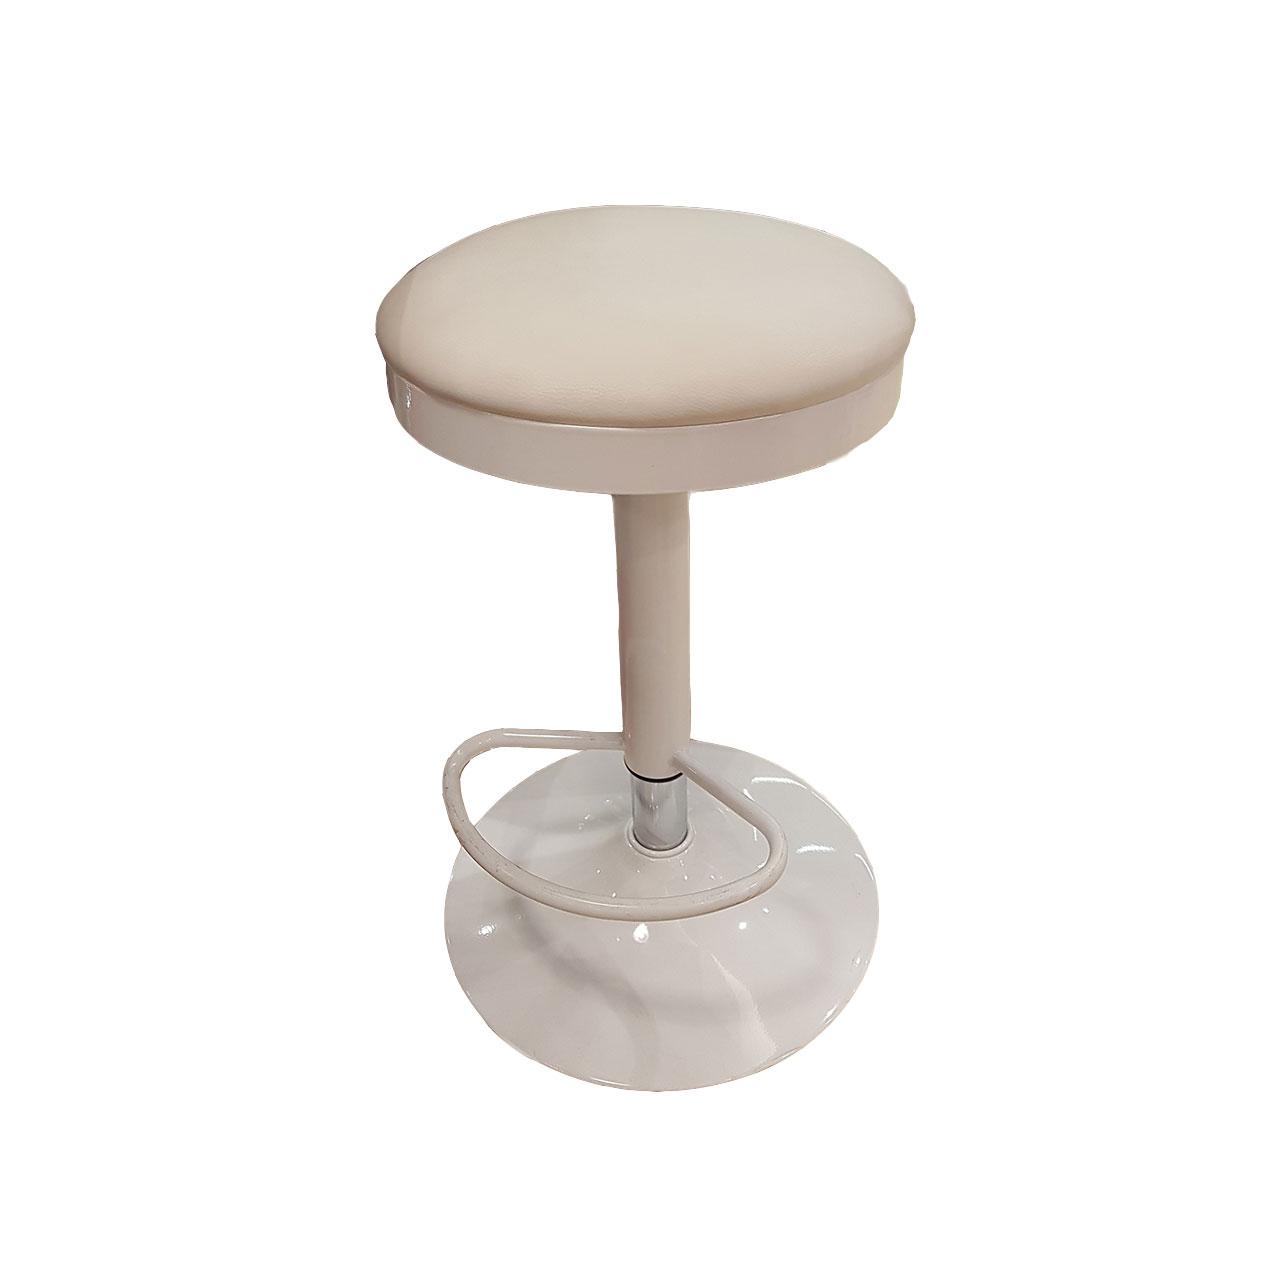 stool chair ph keyboard tray for osbert bar furniture store manila philippines